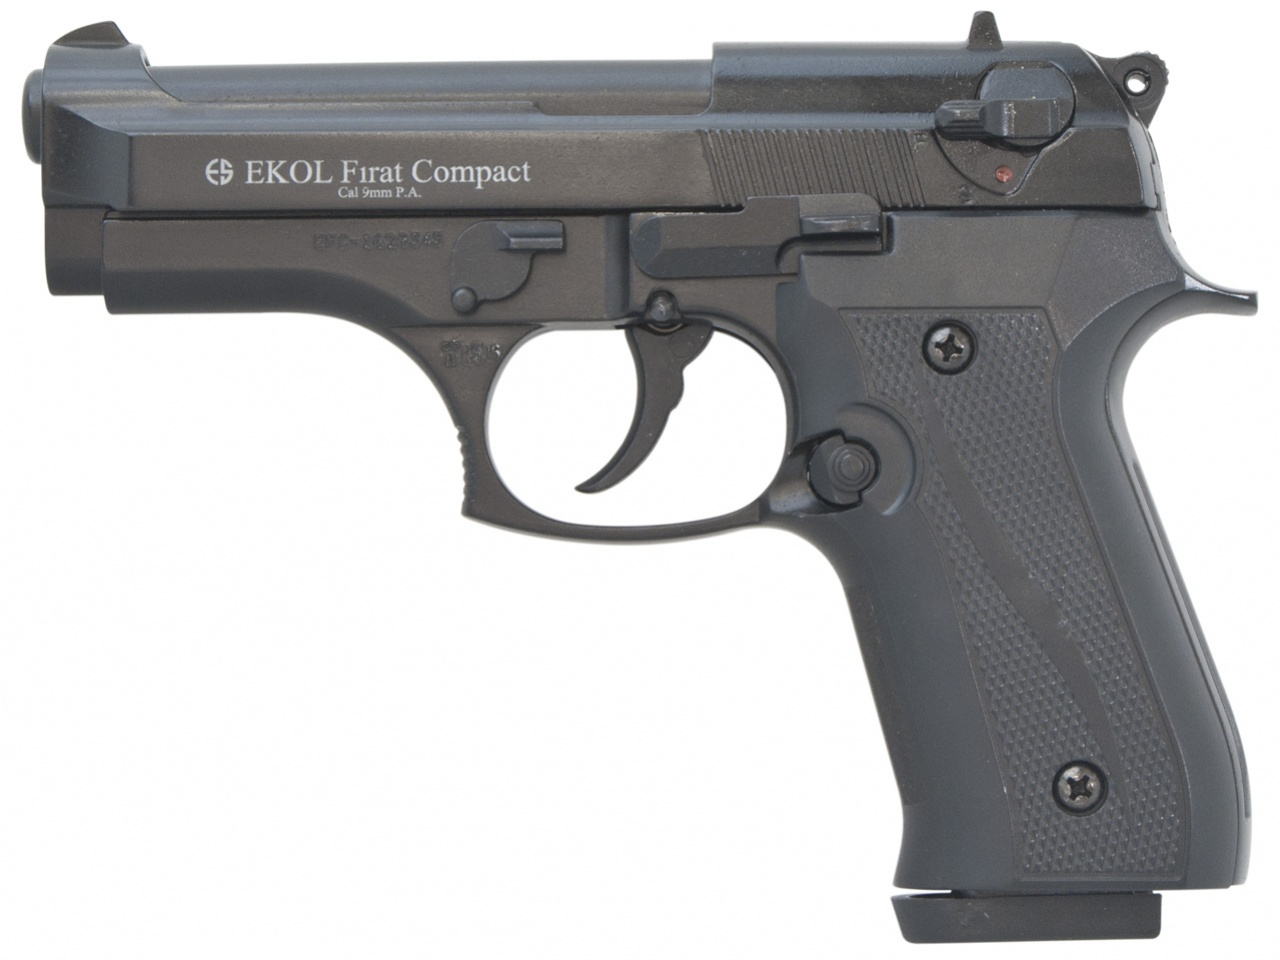 Pistolet gazowy Ekol Firat Compact czarny kal.9mm